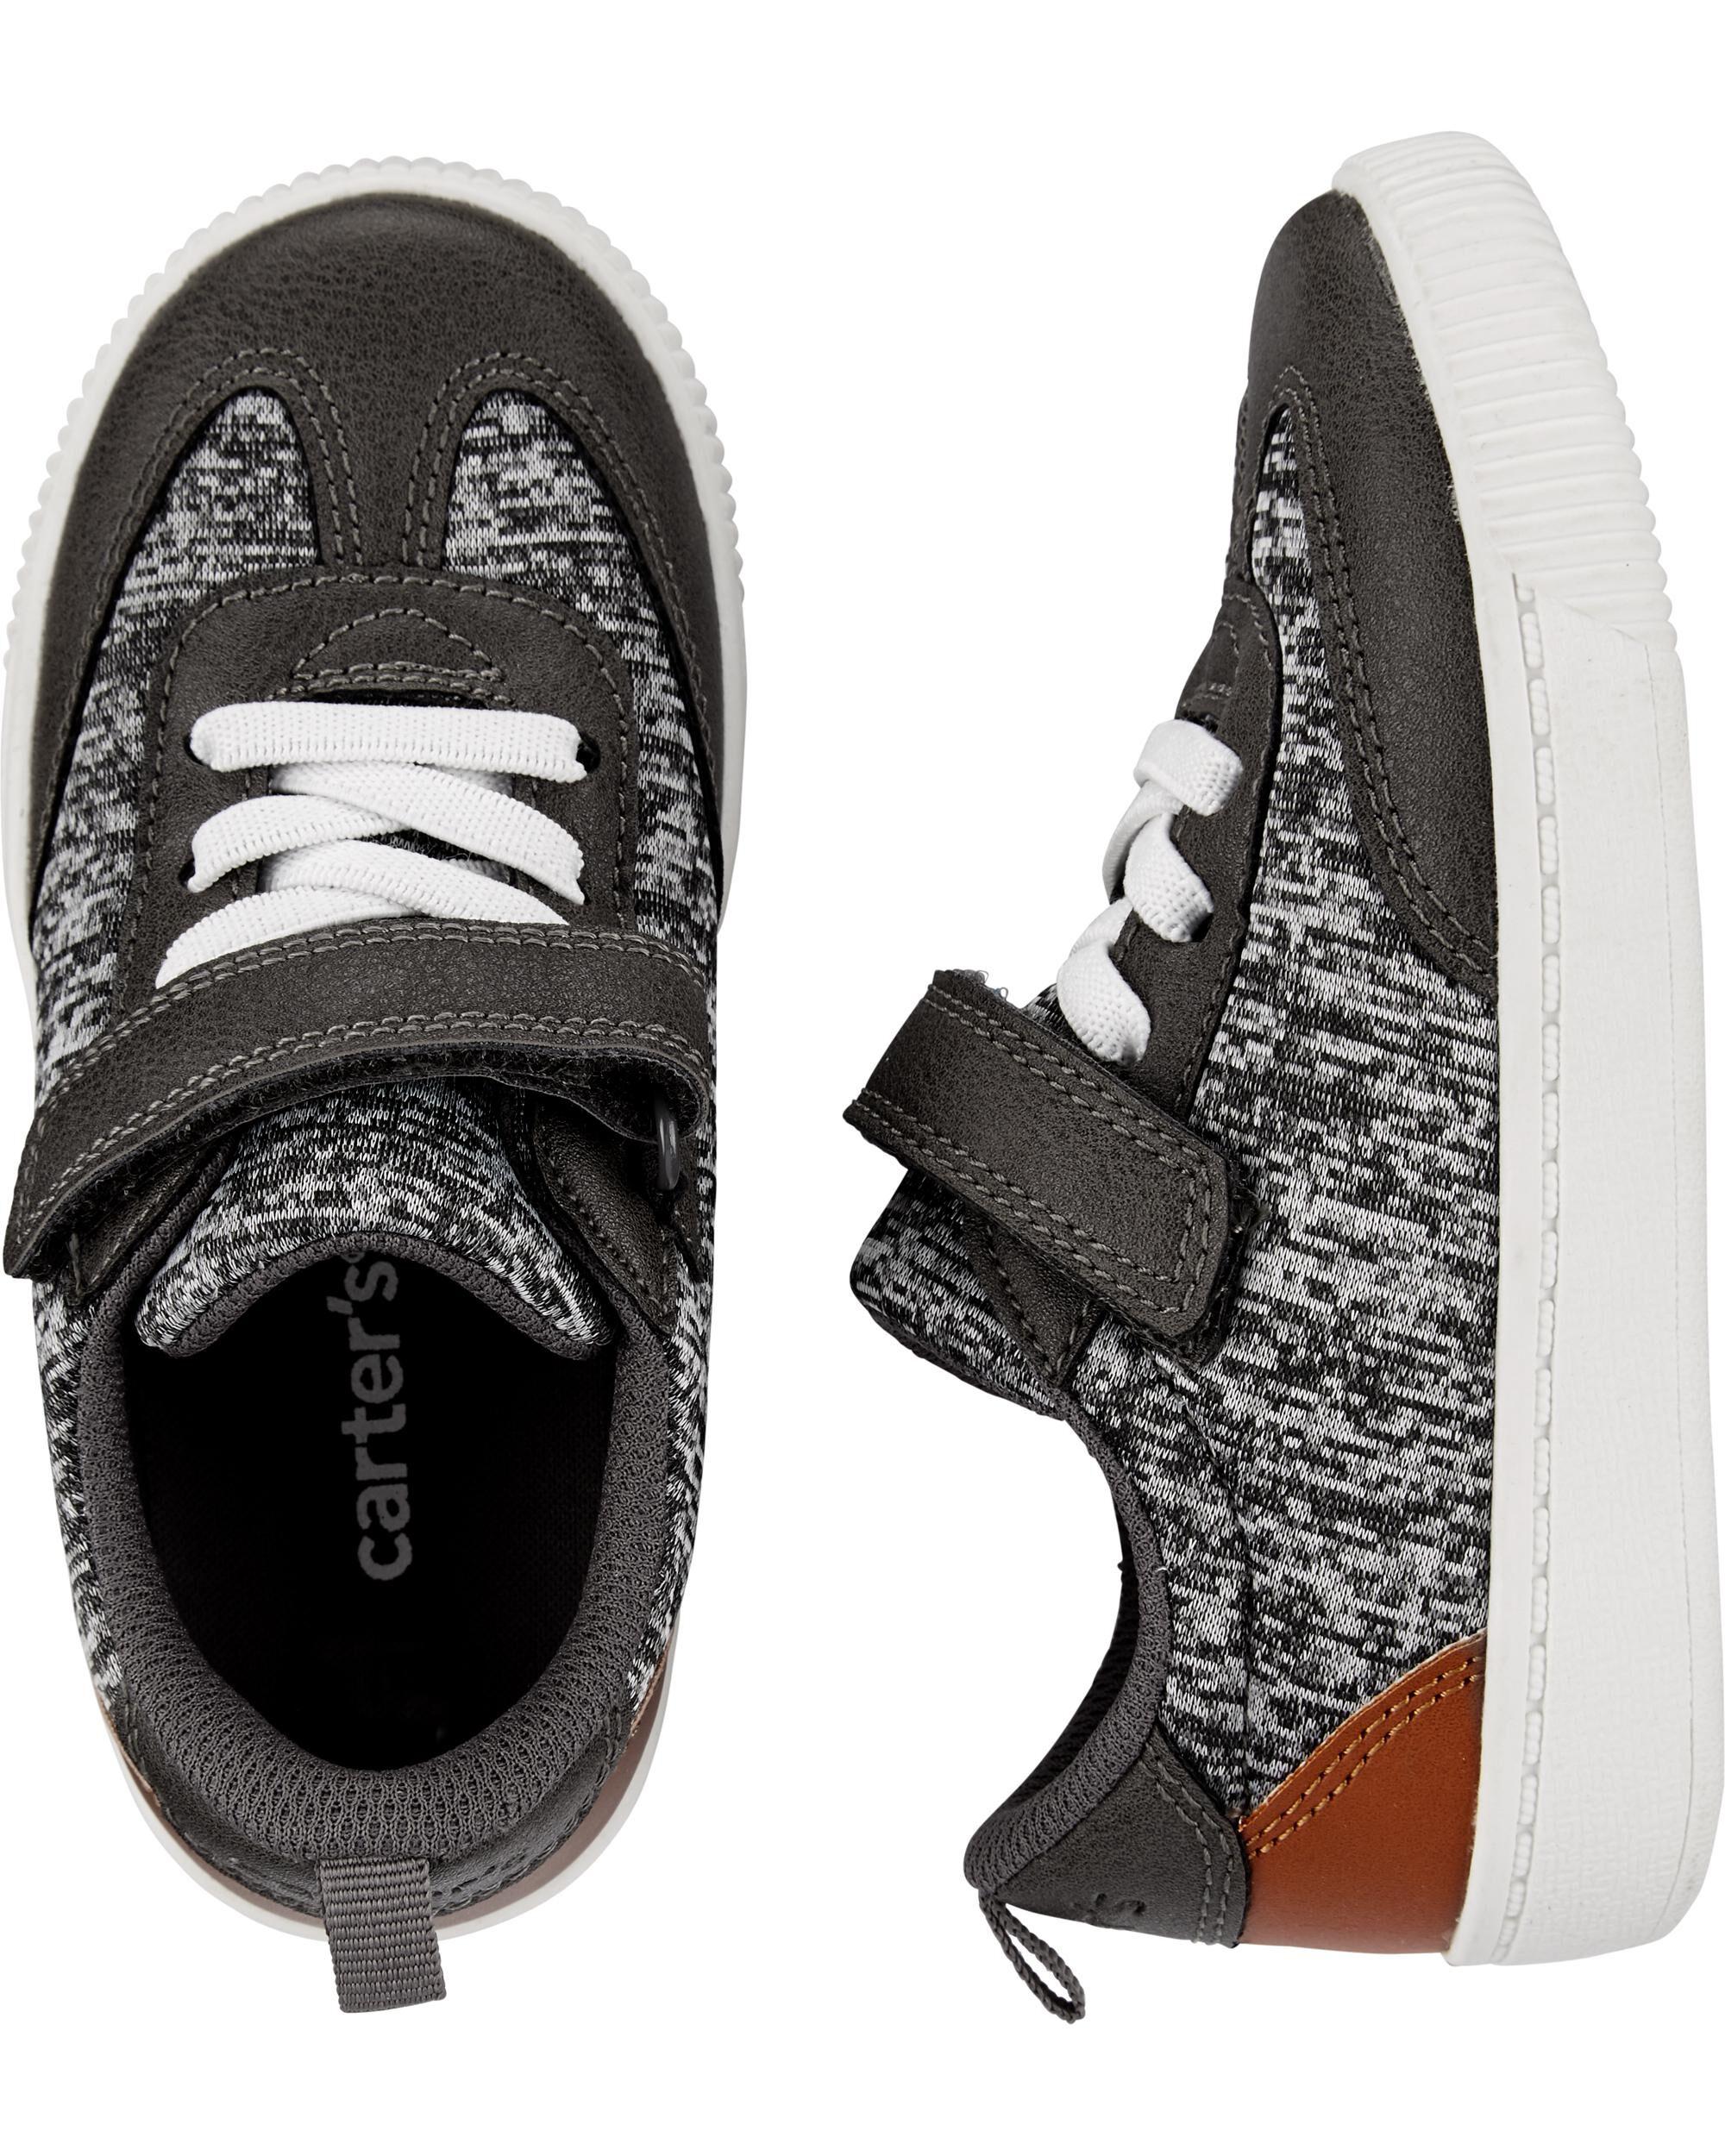 Carters Casual Sneakers